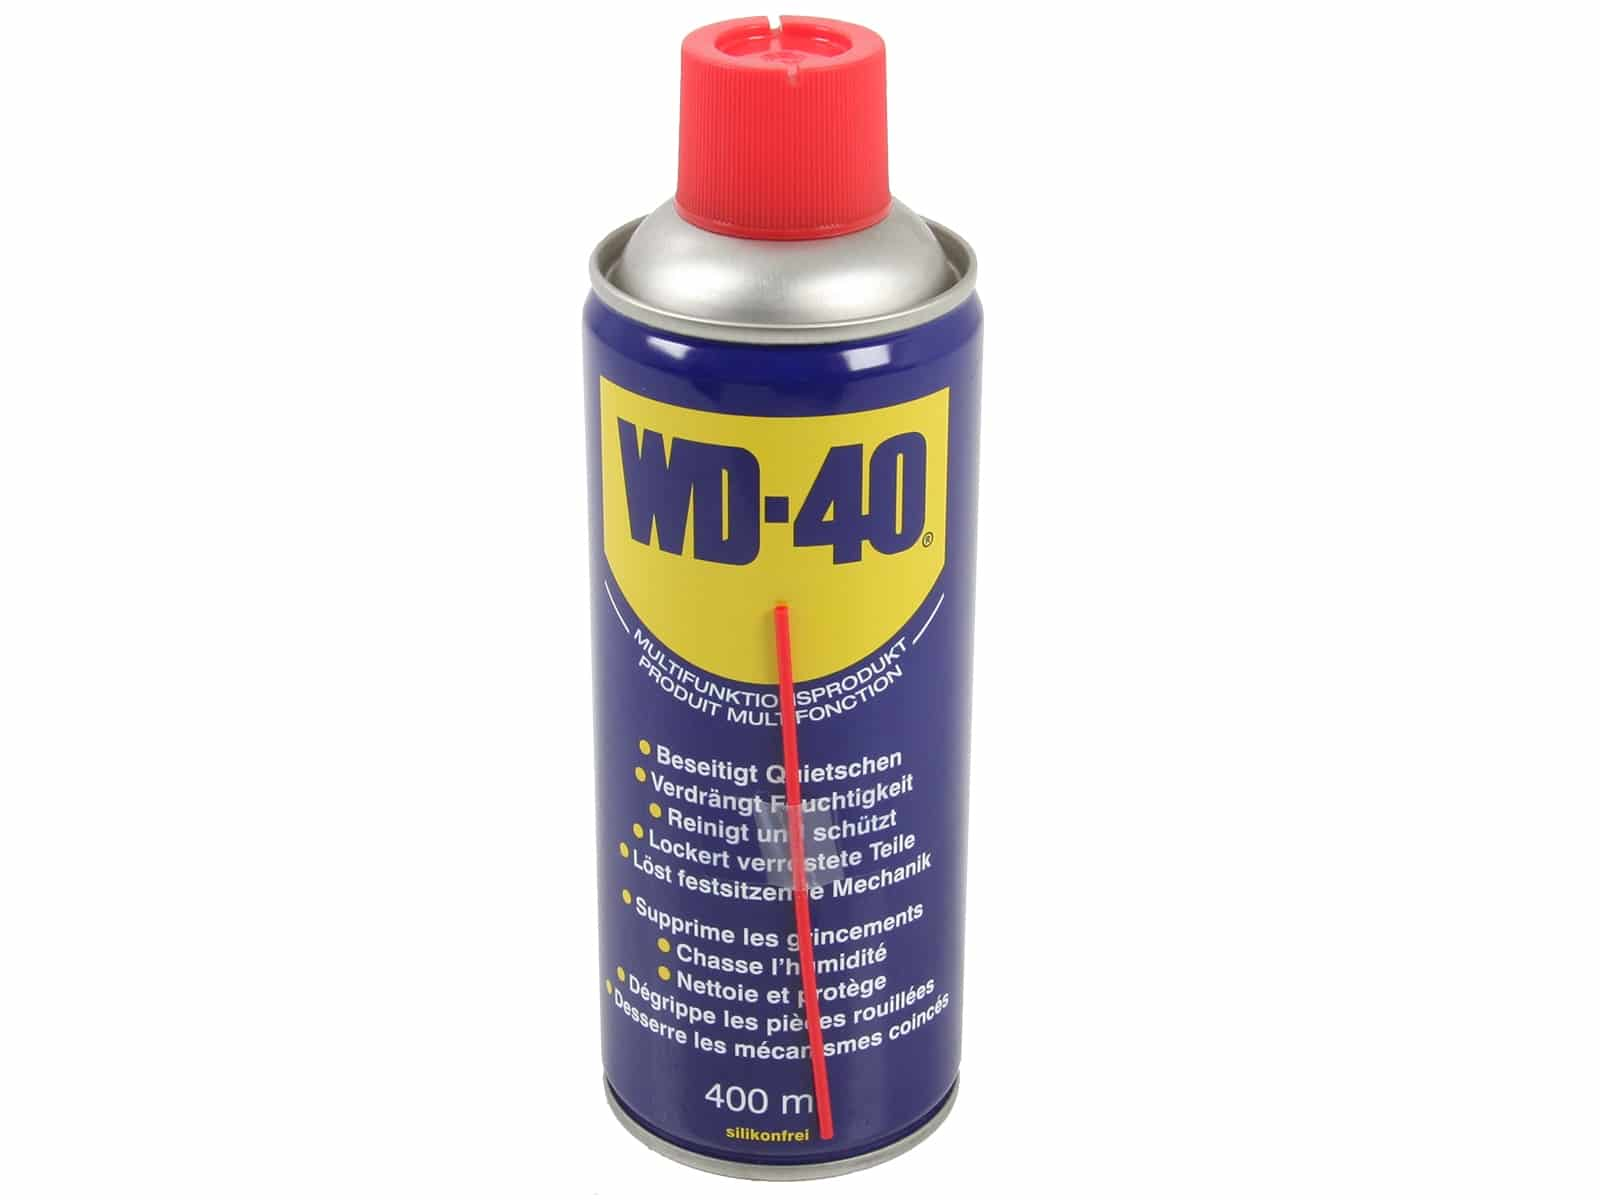 WD-40 Multifunktionsspray 400ml